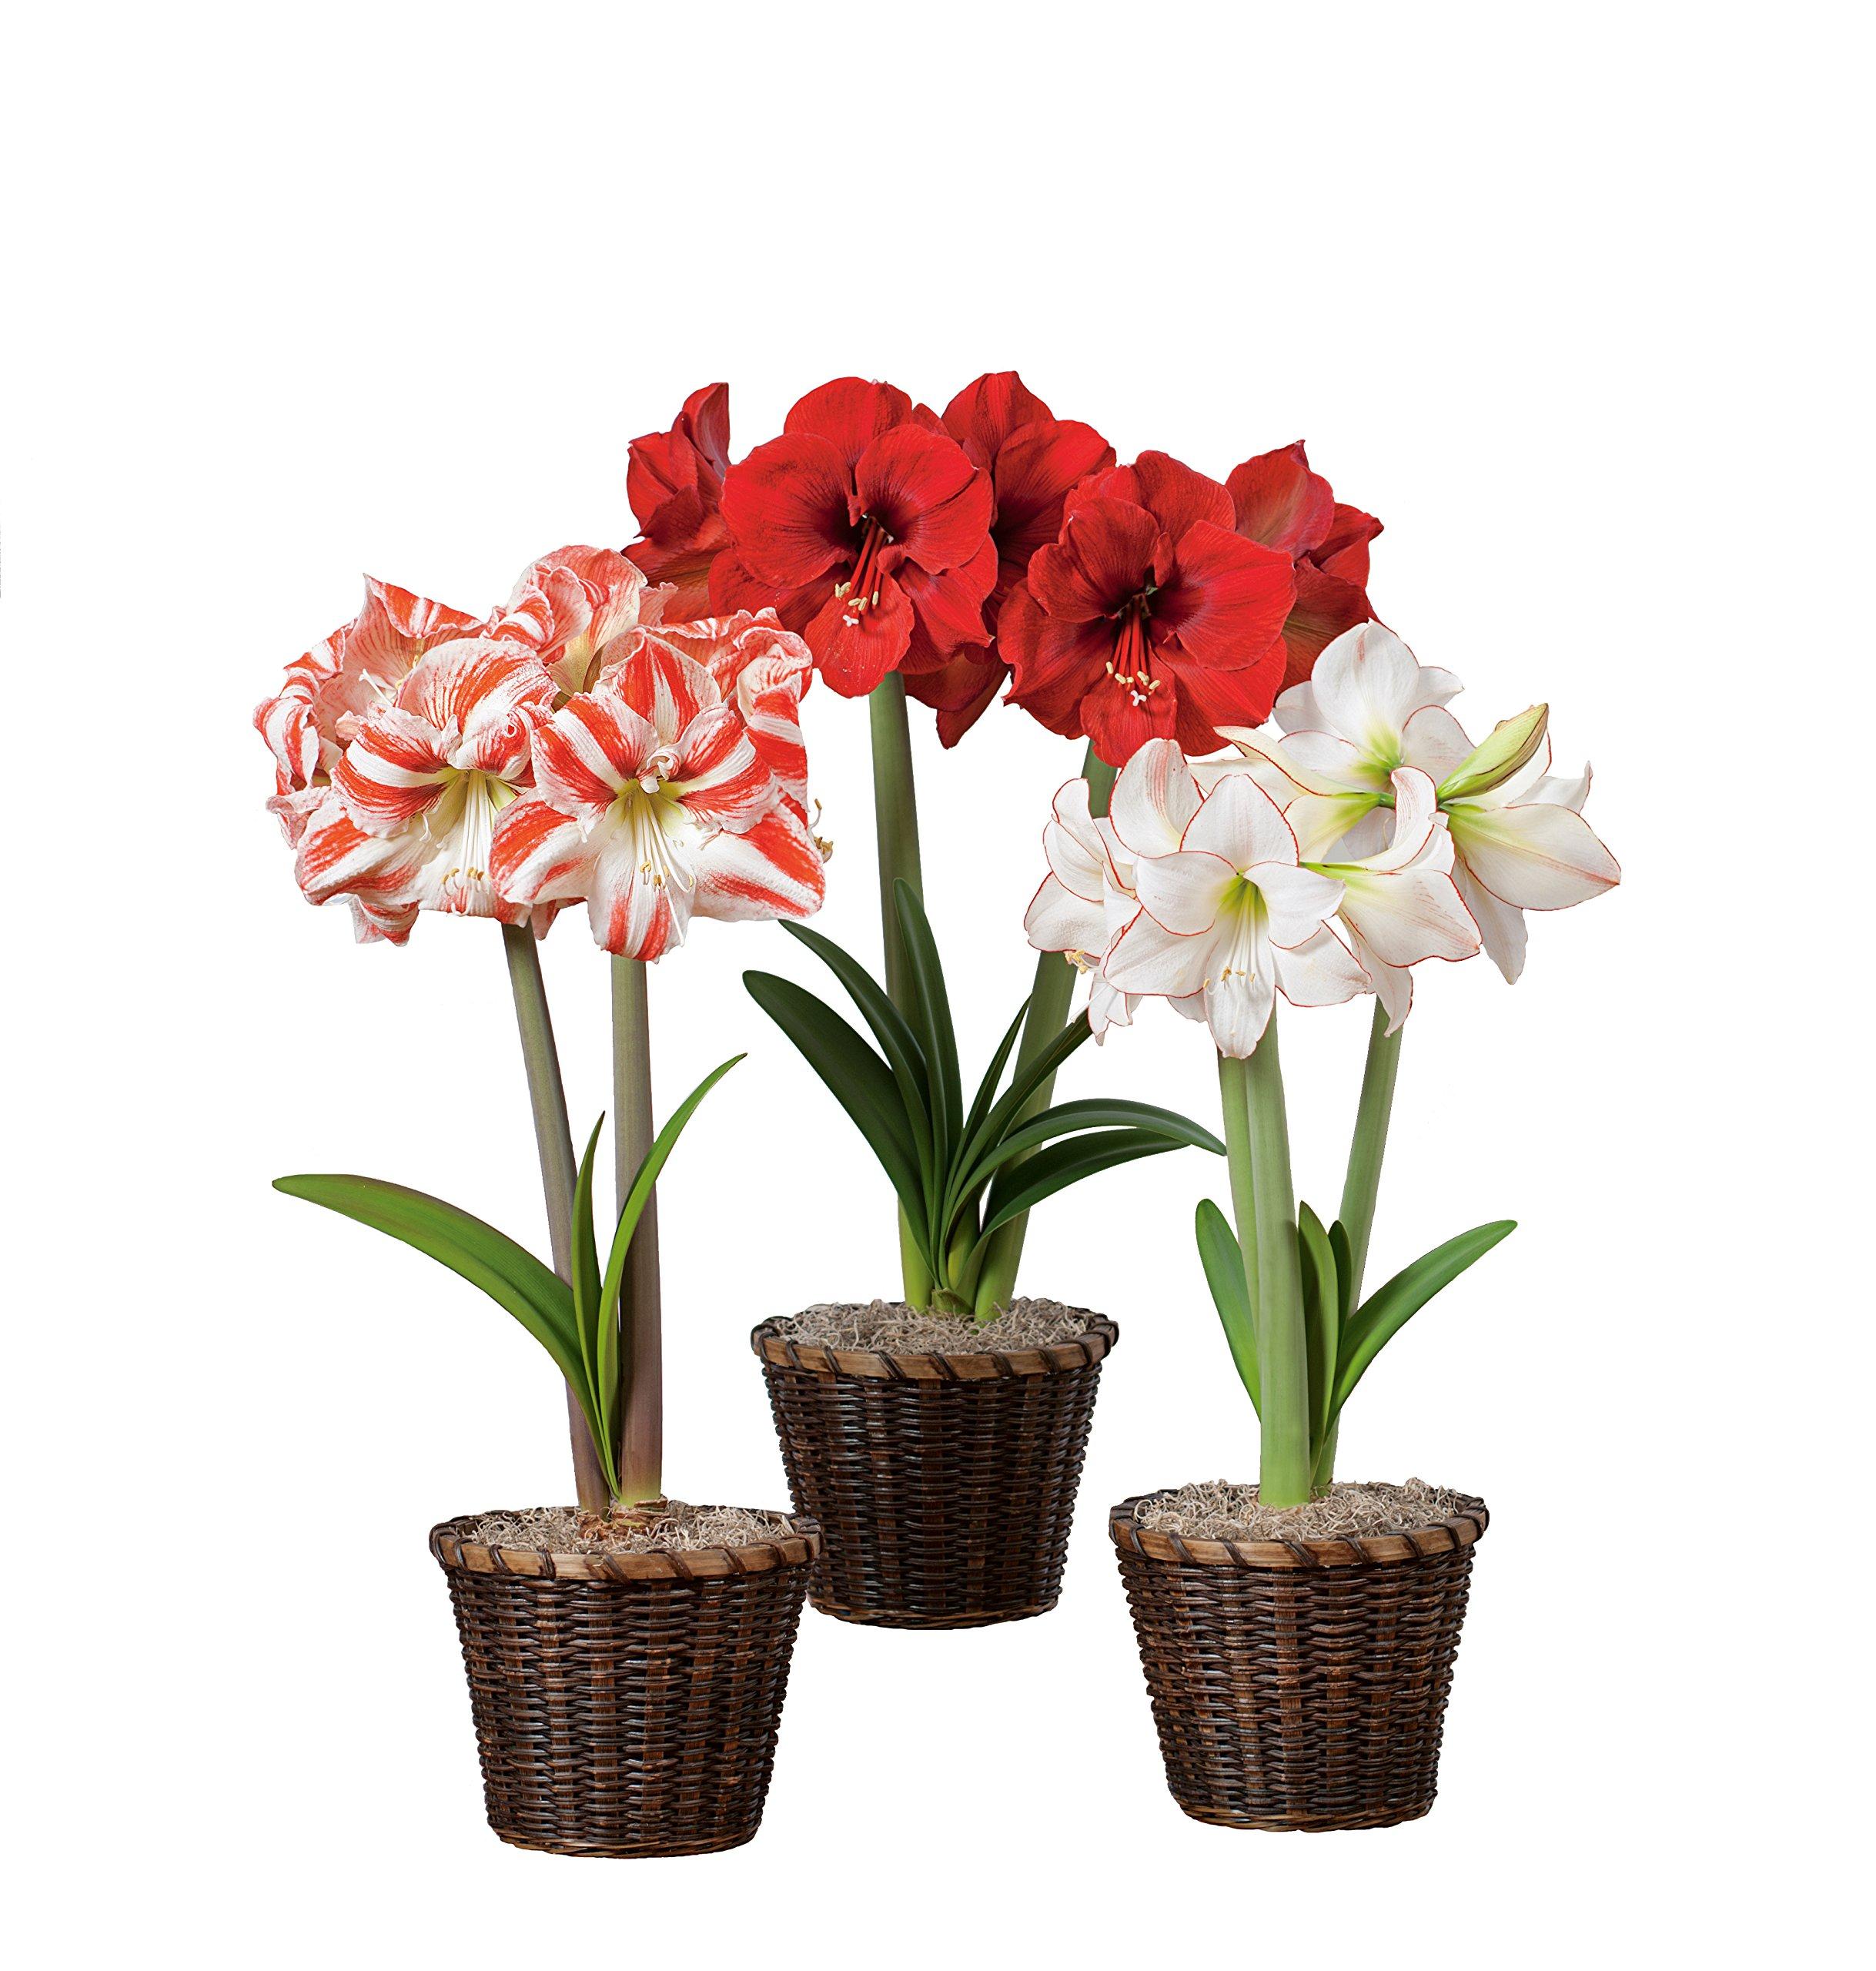 Hallmark Flowers Amaryllis Bulbs Trio In Brown Woven Baskets (Pack of 3)